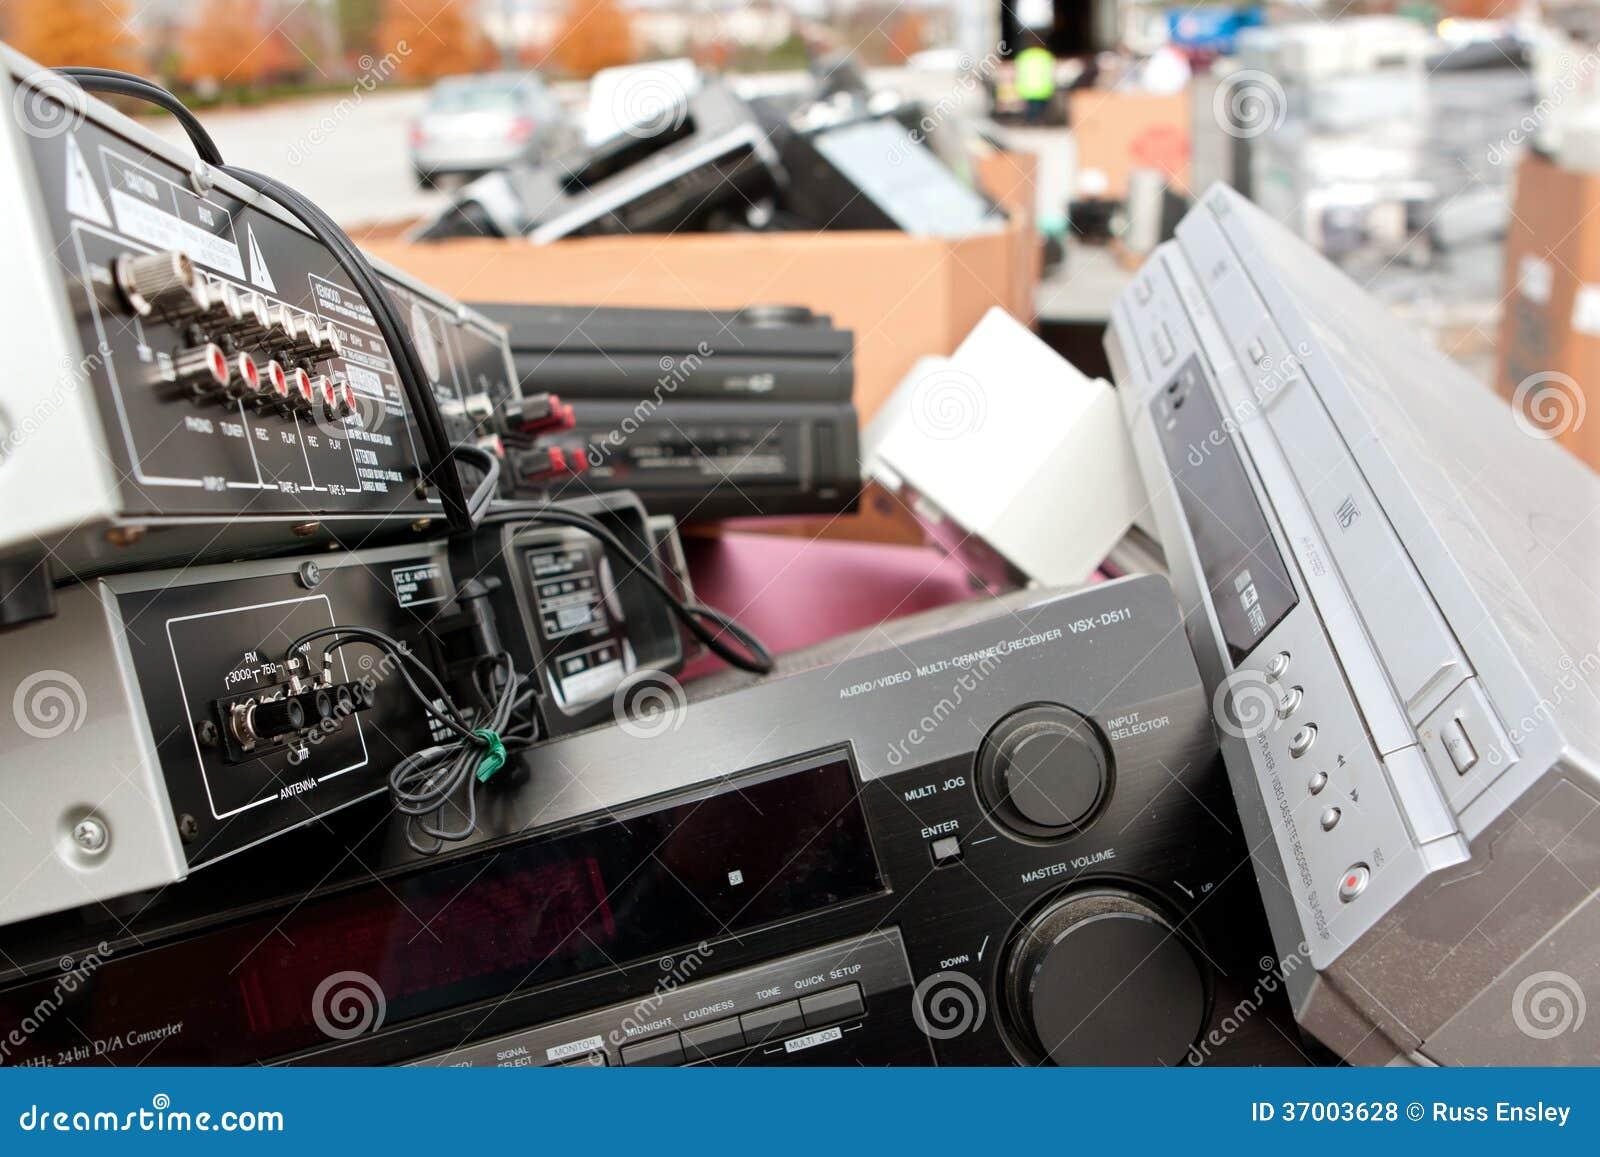 Used Car Batteries In Lawrenceville Ga